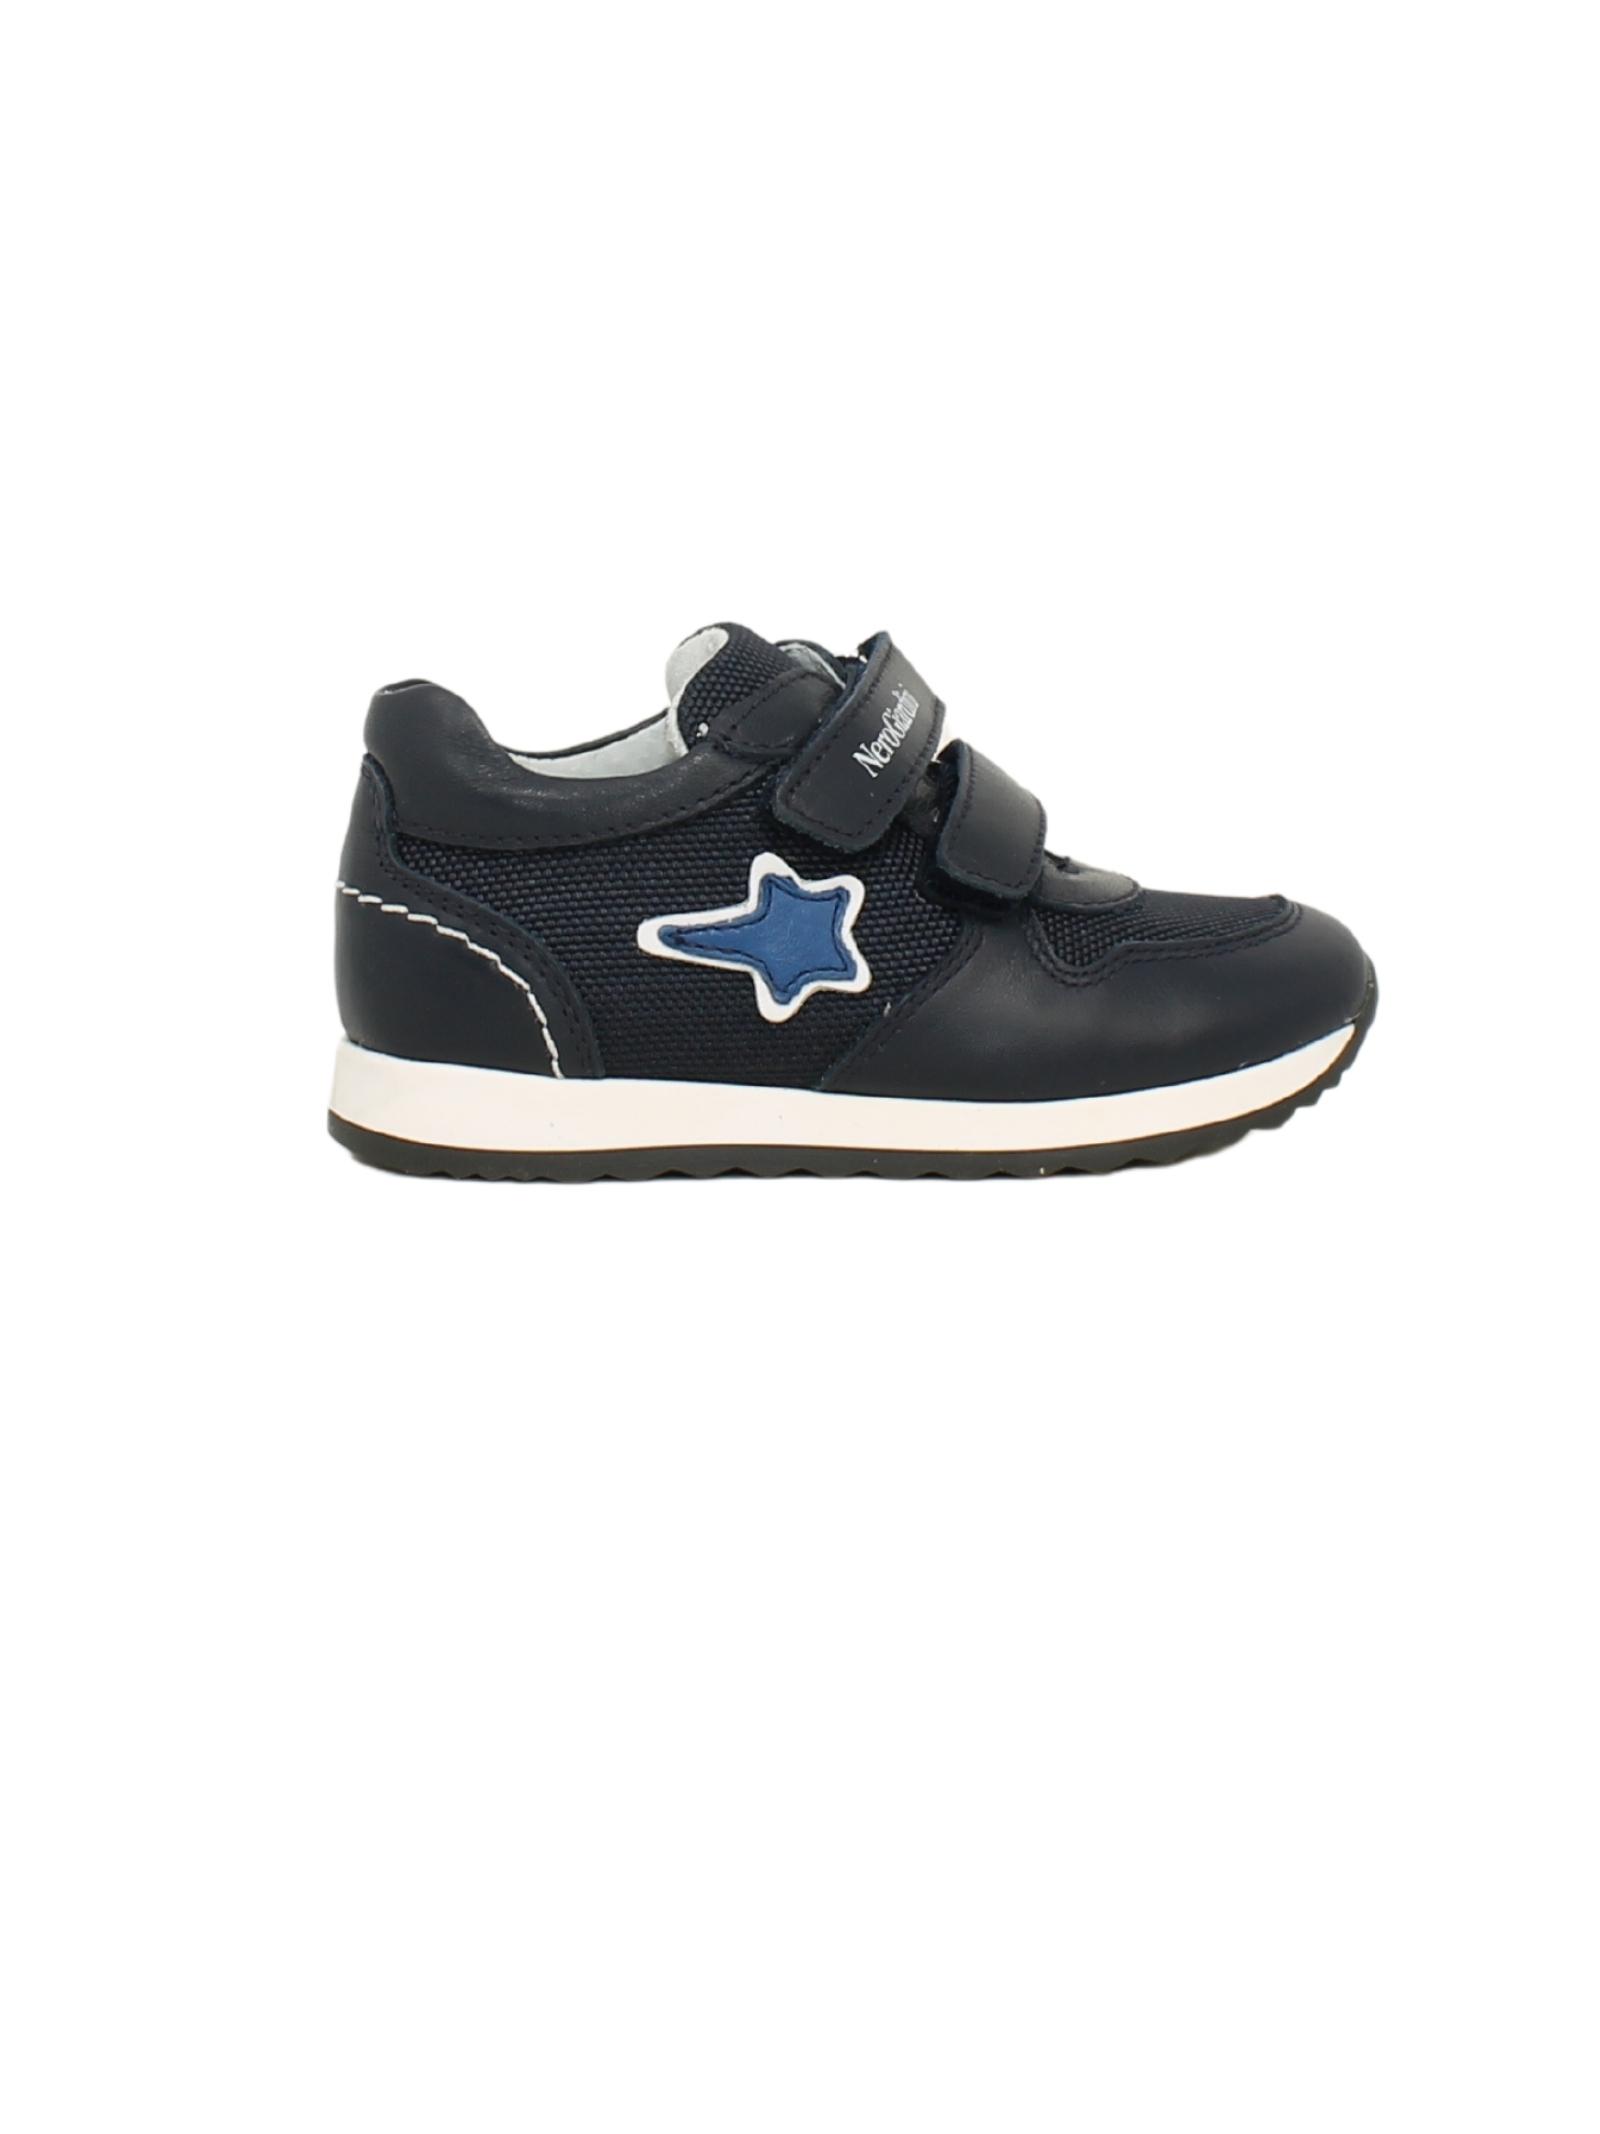 Sneakers Stars Blu Bambino NERO GIARDINI JUNIOR   Sneakers   124611M200